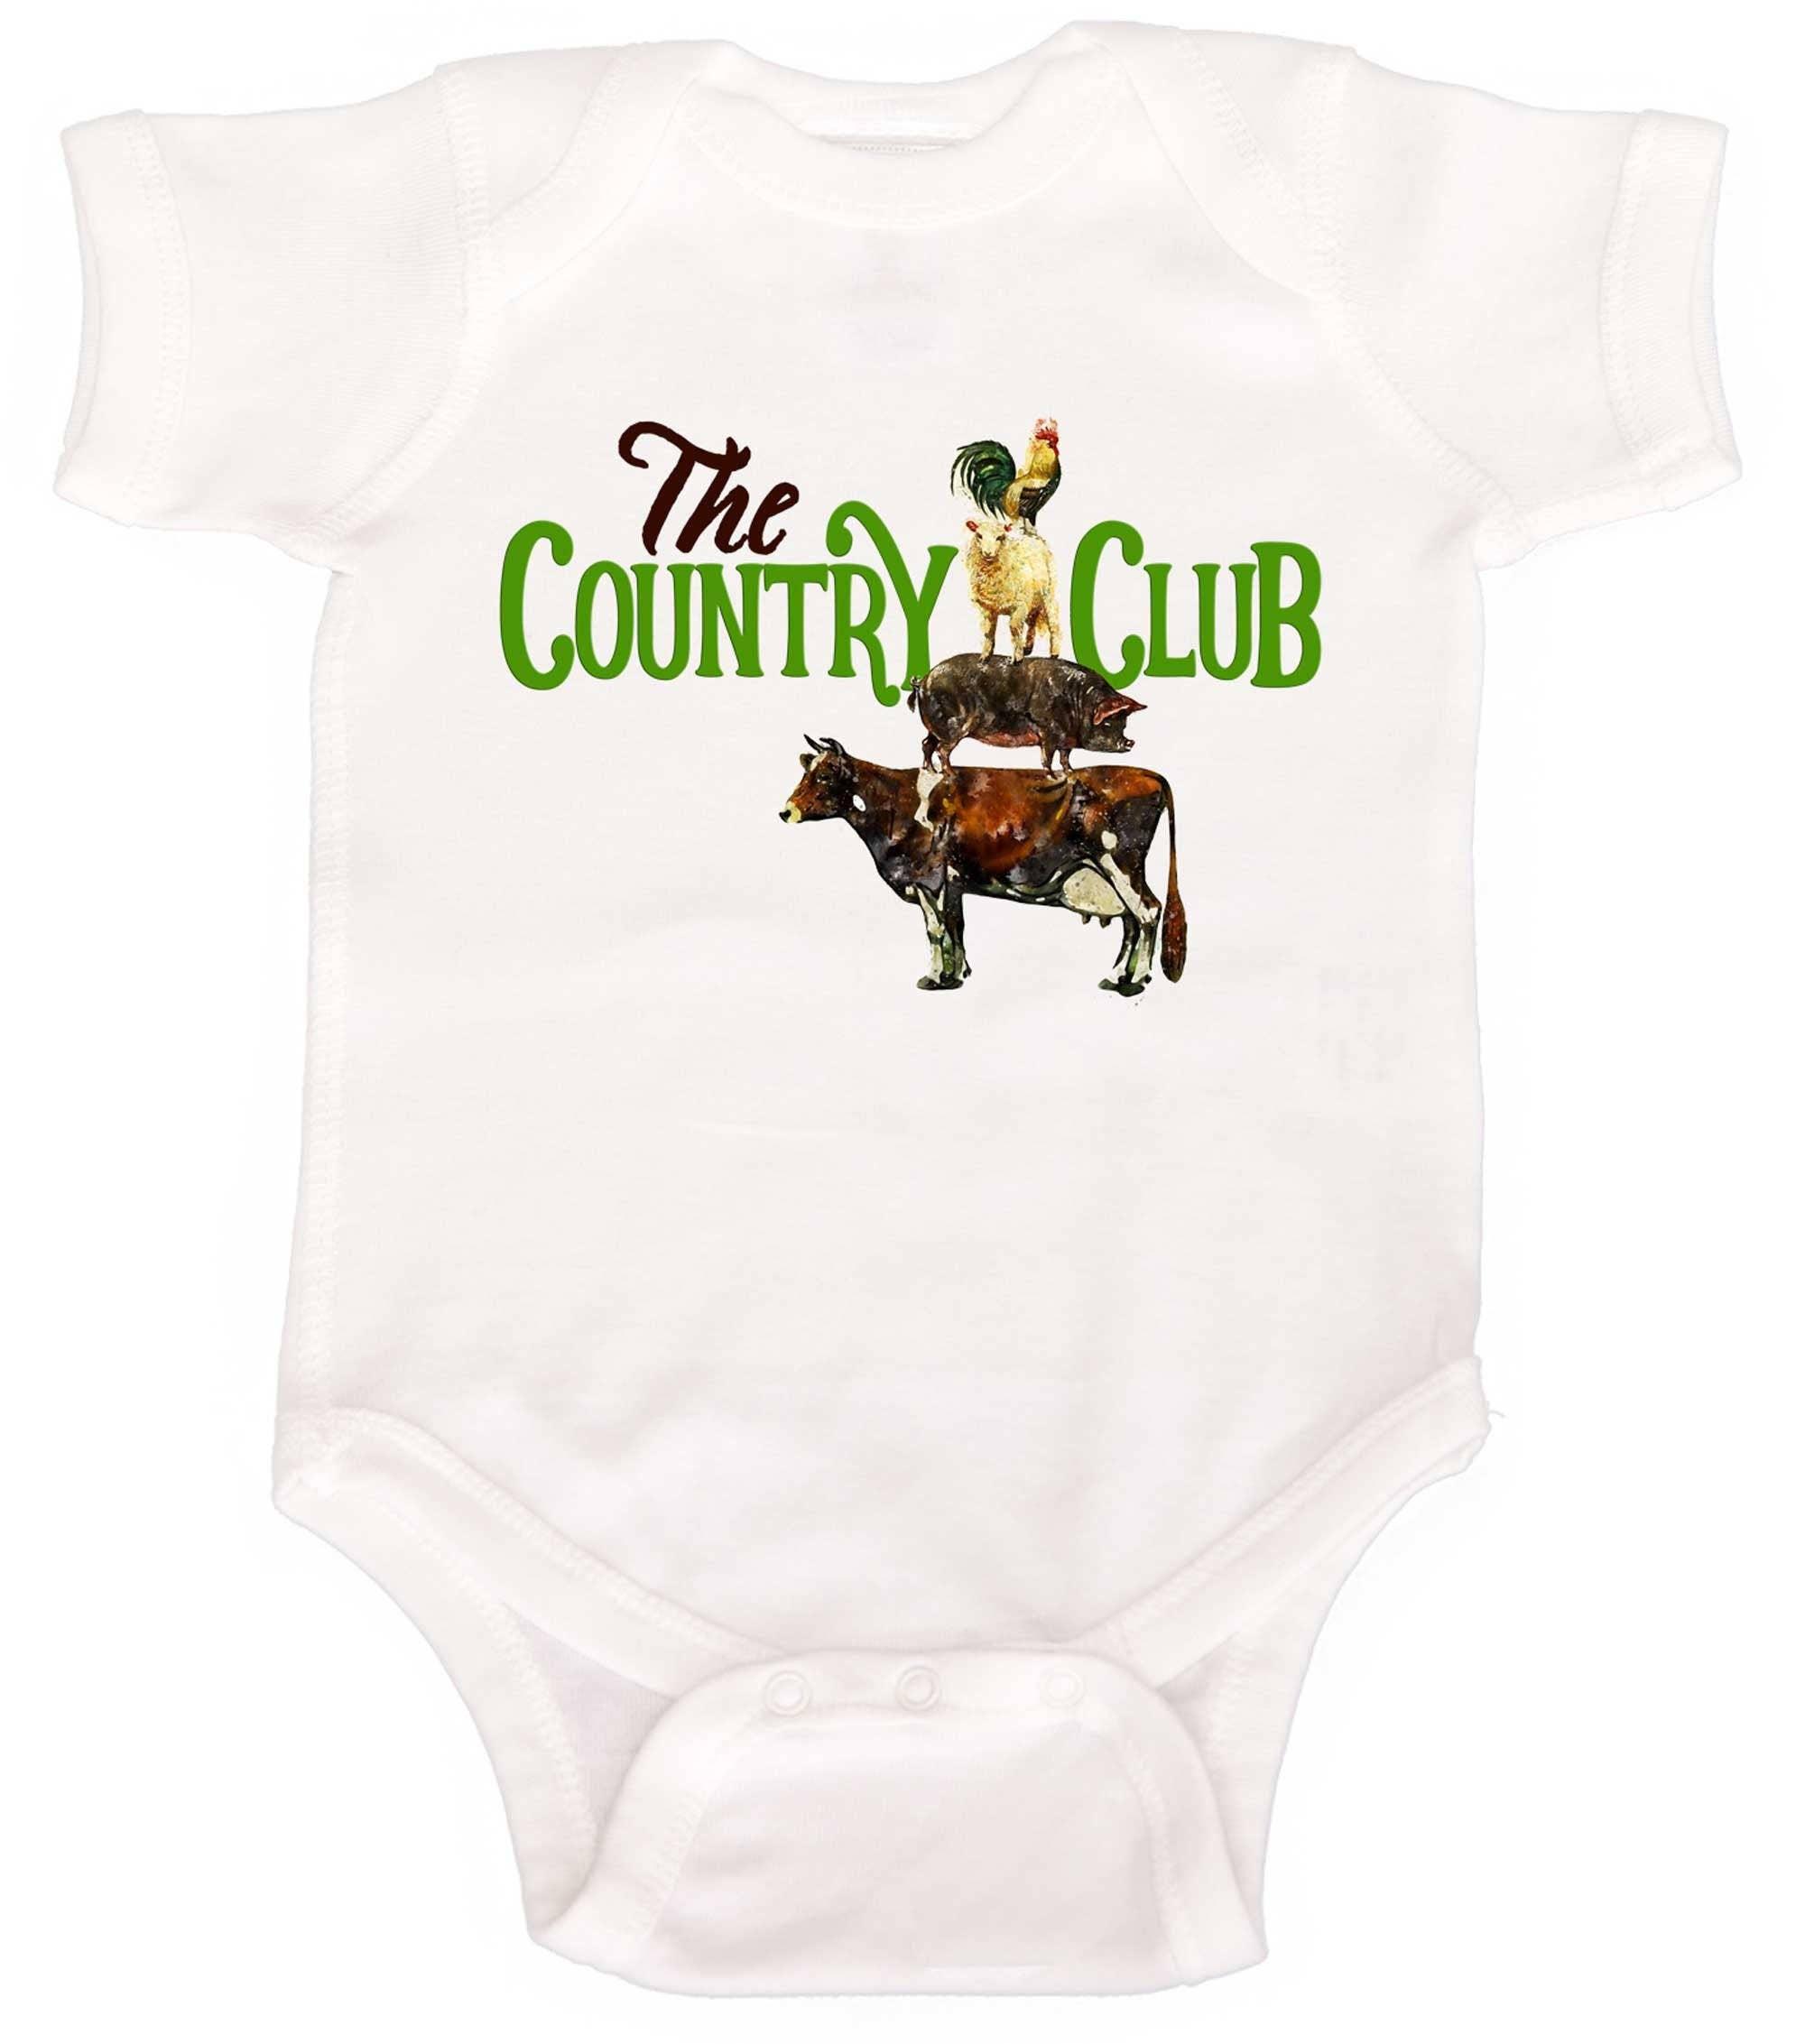 farm baby shirt goat baby clothes farm baby gift new kid on the  block farm nursery goat gifts organic baby clothes farm nursery